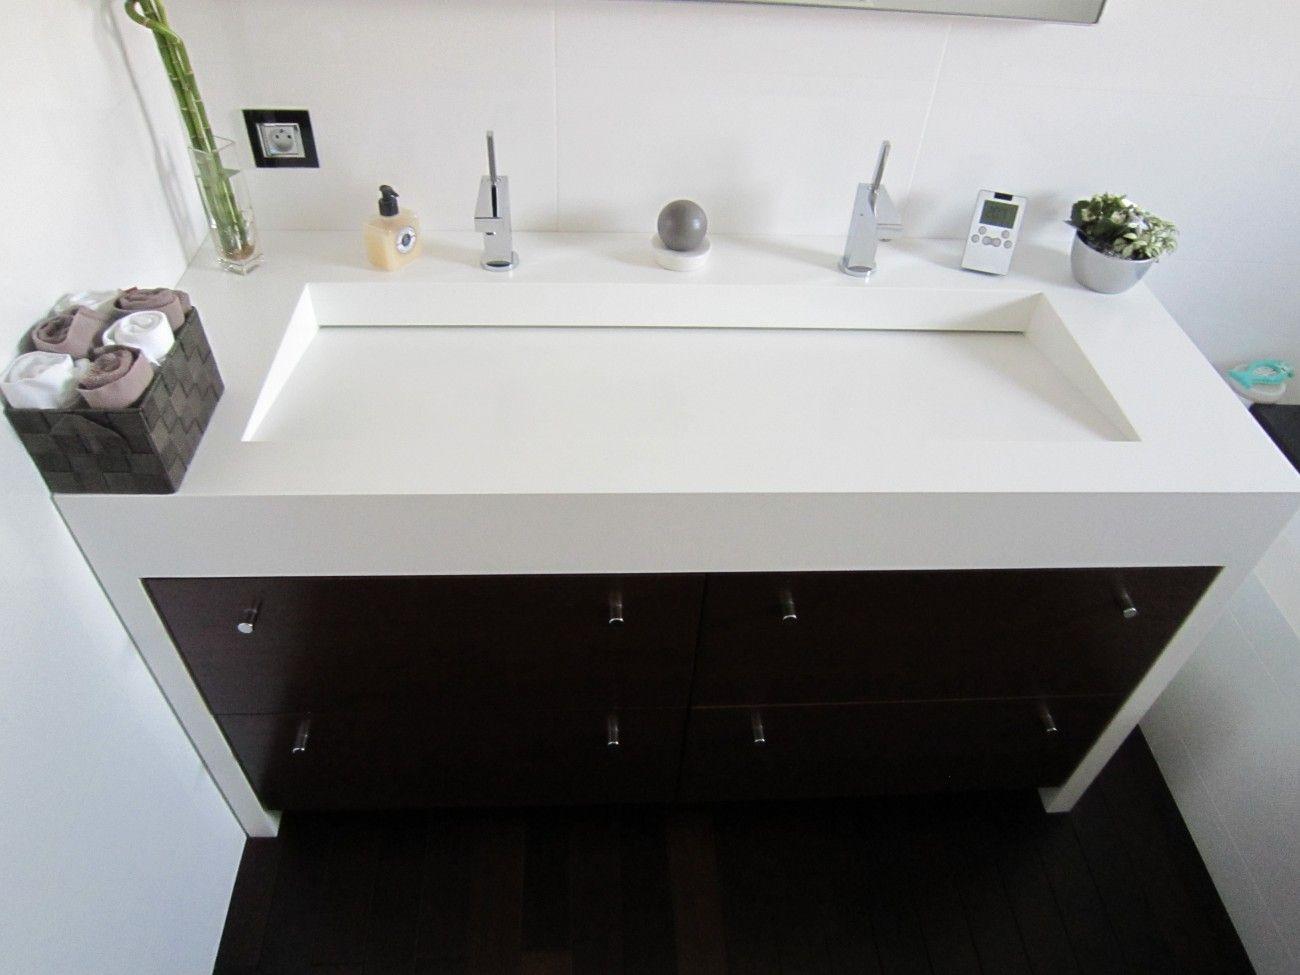 Cuisine Corian & Salle de bain Corian  Salle de bain design